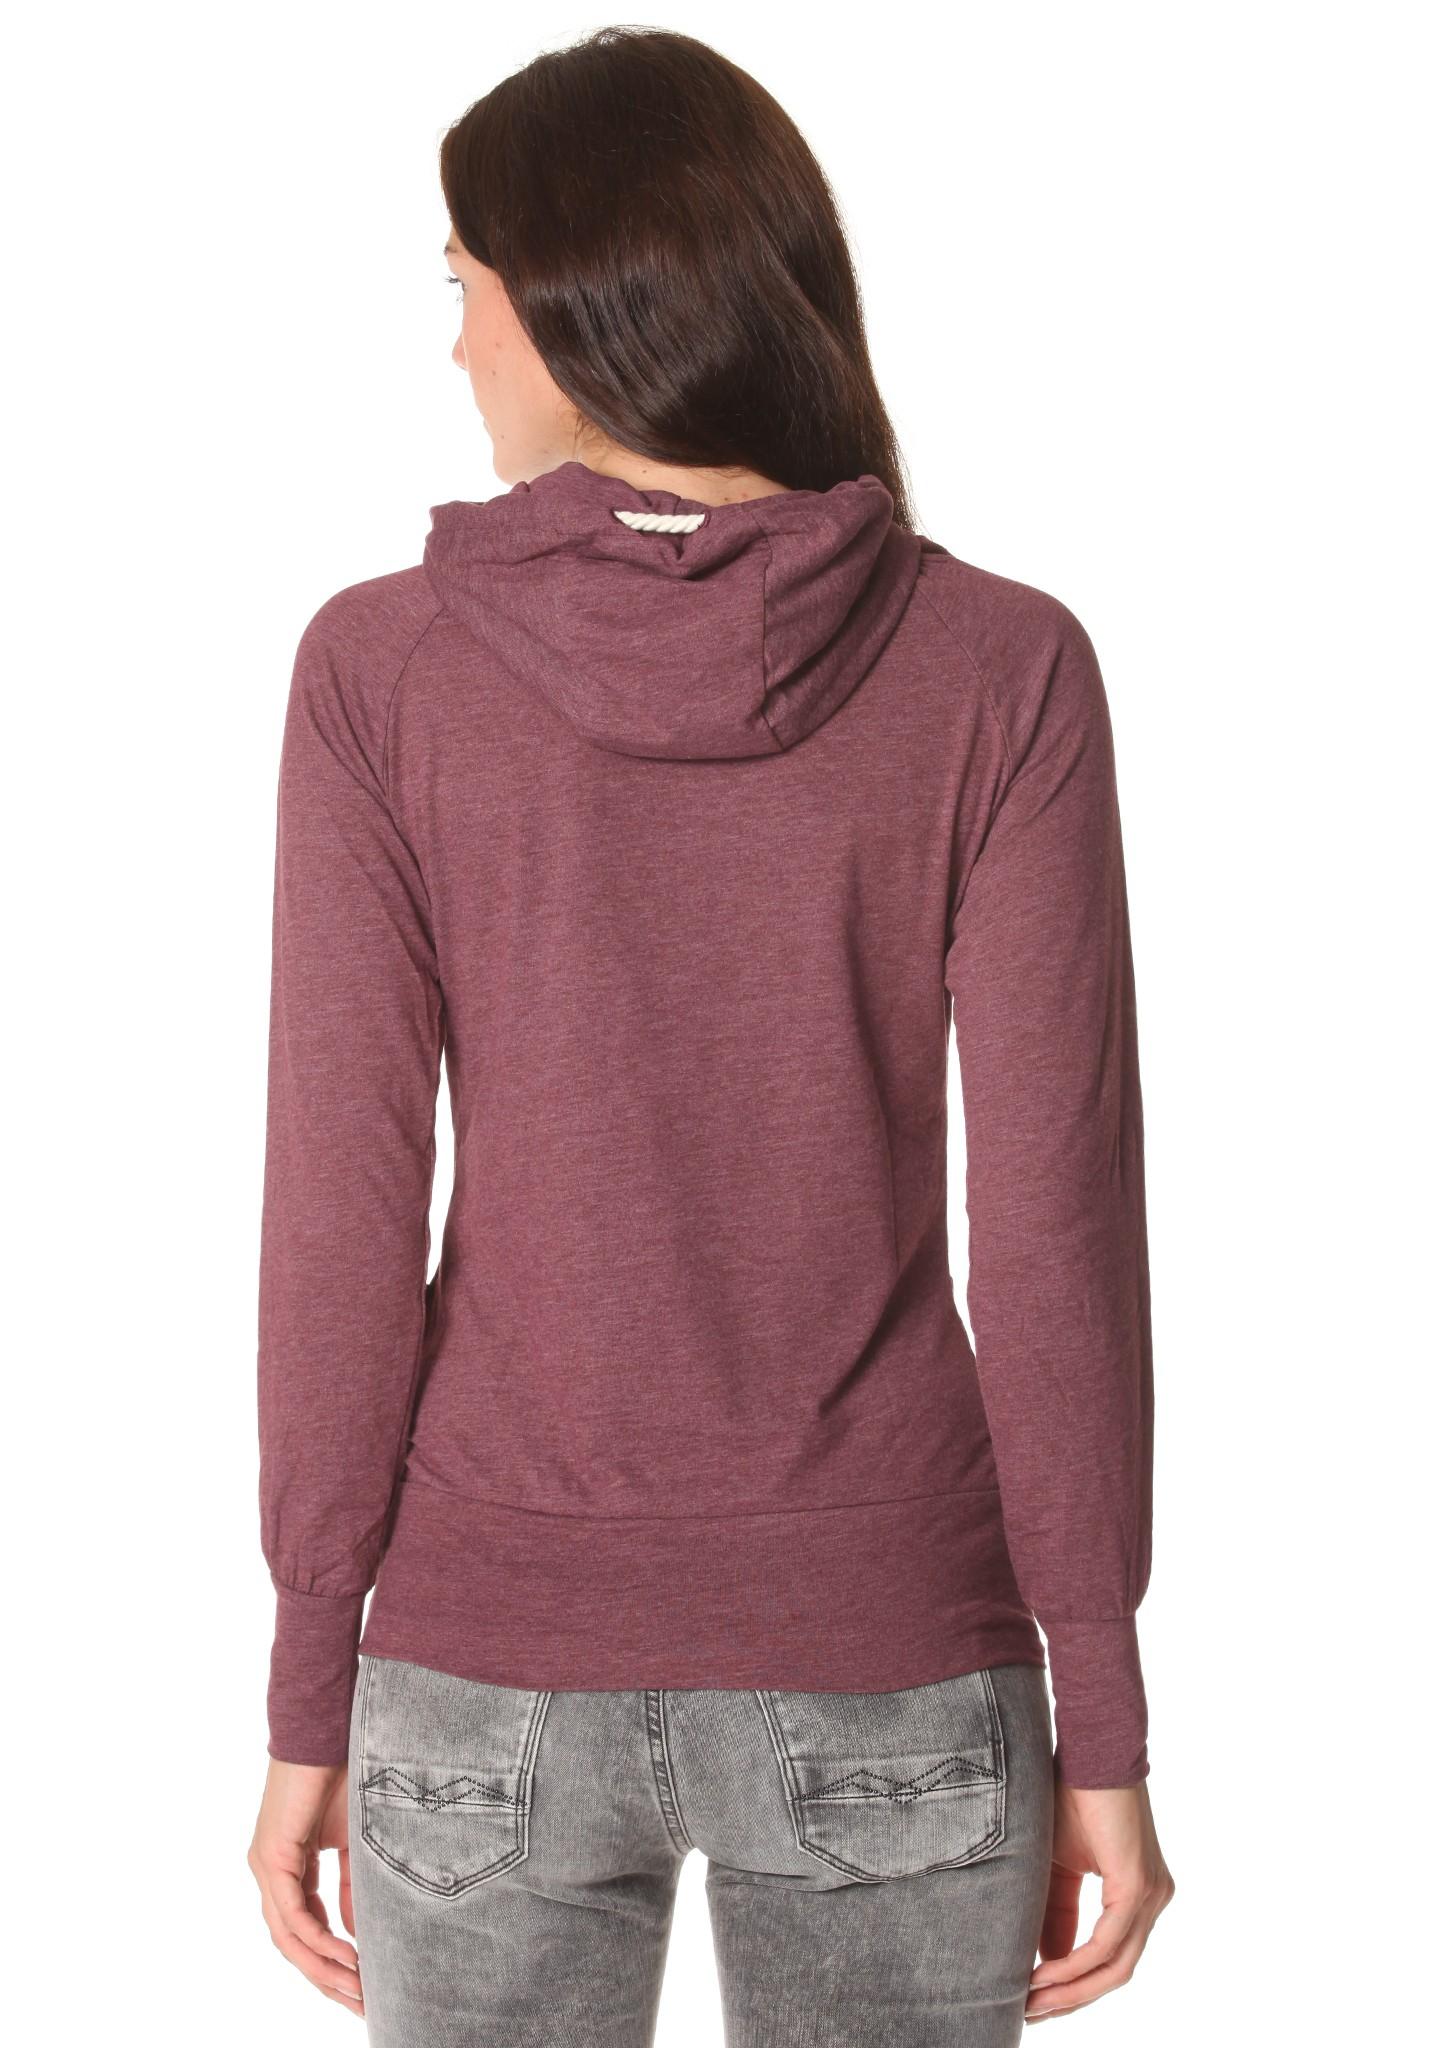 neu naketano mandy vii damen kapuzenpullover pullover hoodie kapuzenjacke ebay. Black Bedroom Furniture Sets. Home Design Ideas